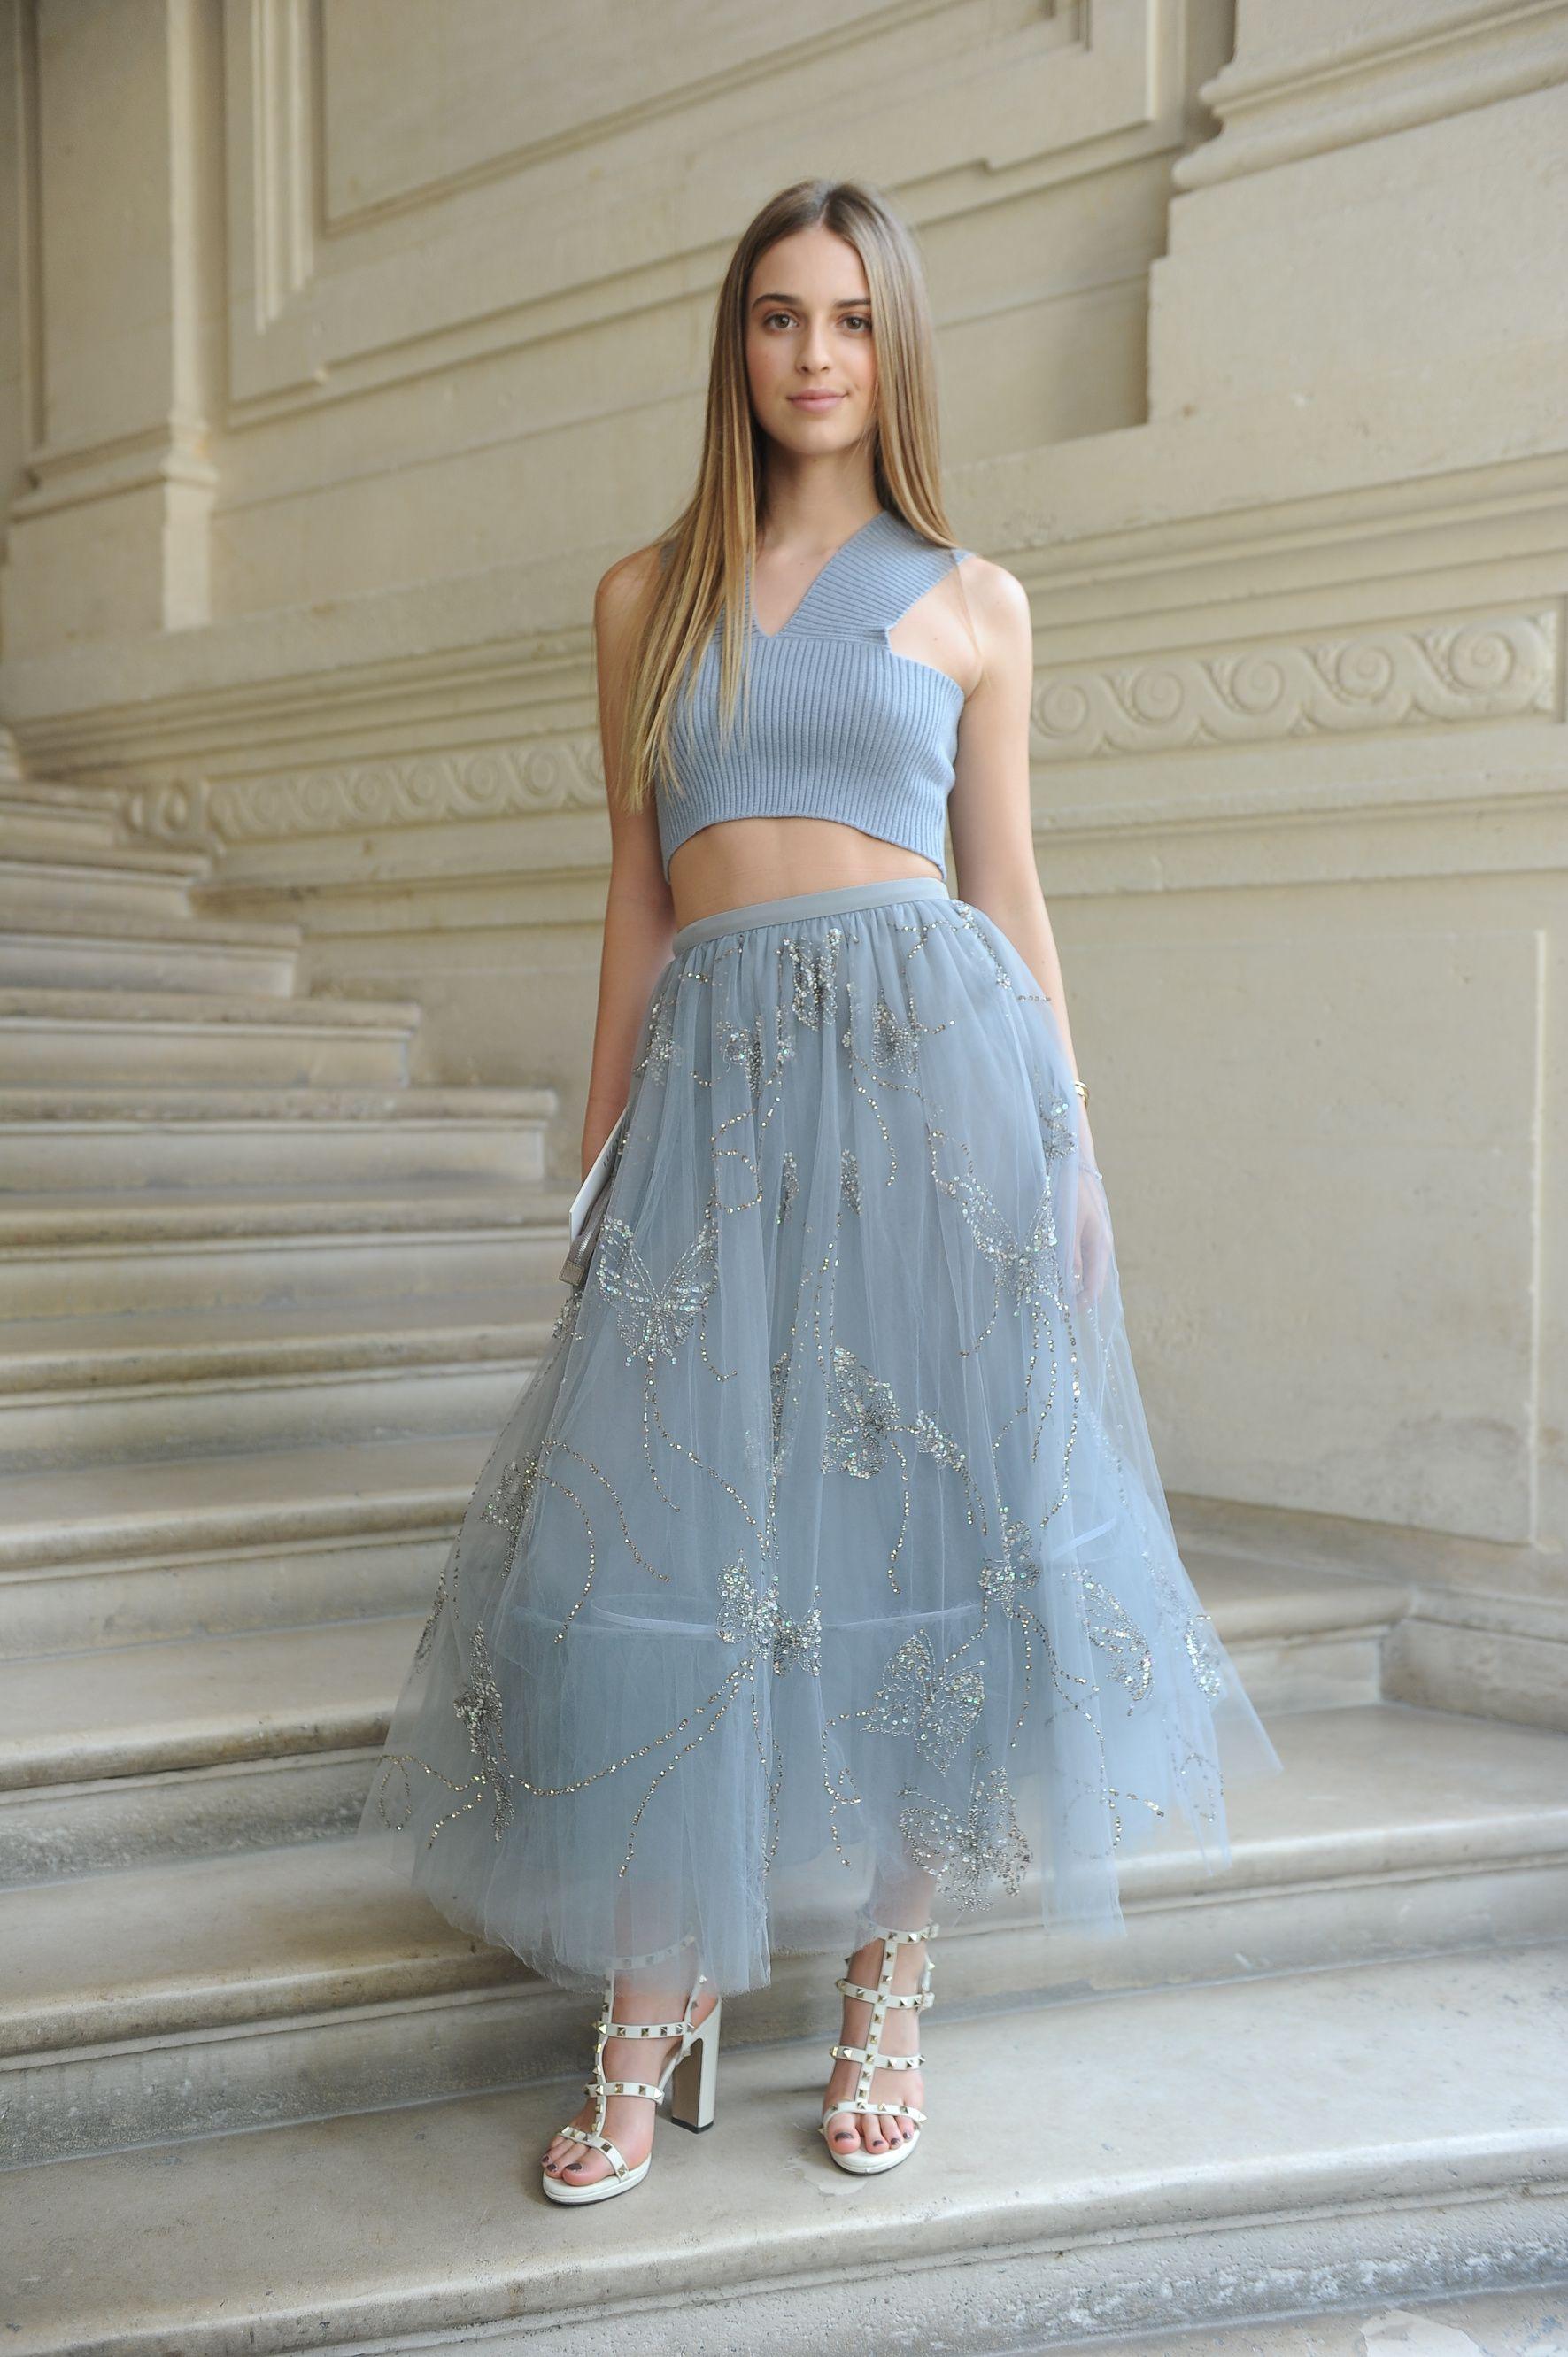 Talita Von Furstenberg wearing a Valentino dress from the Fall